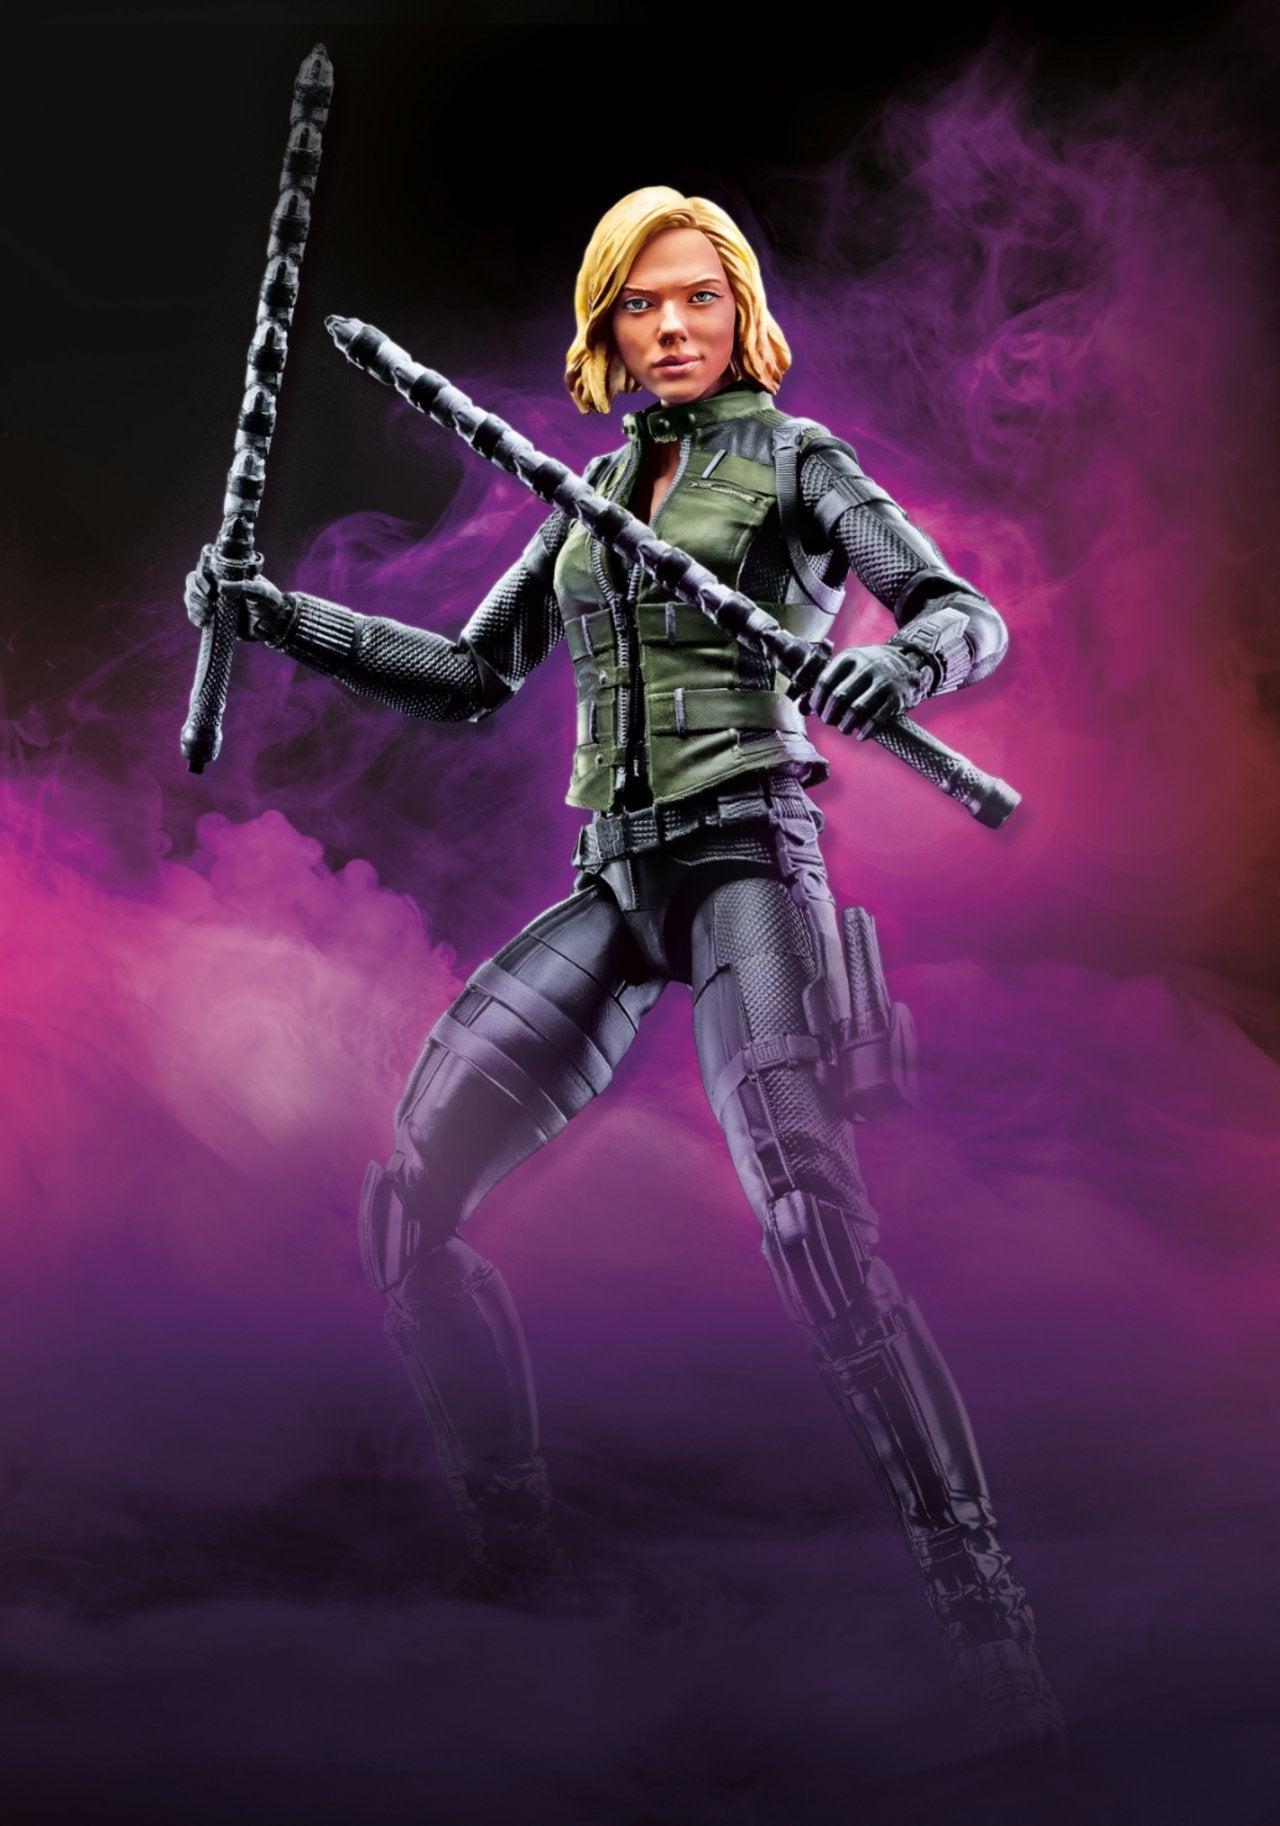 Avengers Infinity War Hasbro Figures - Black Widow